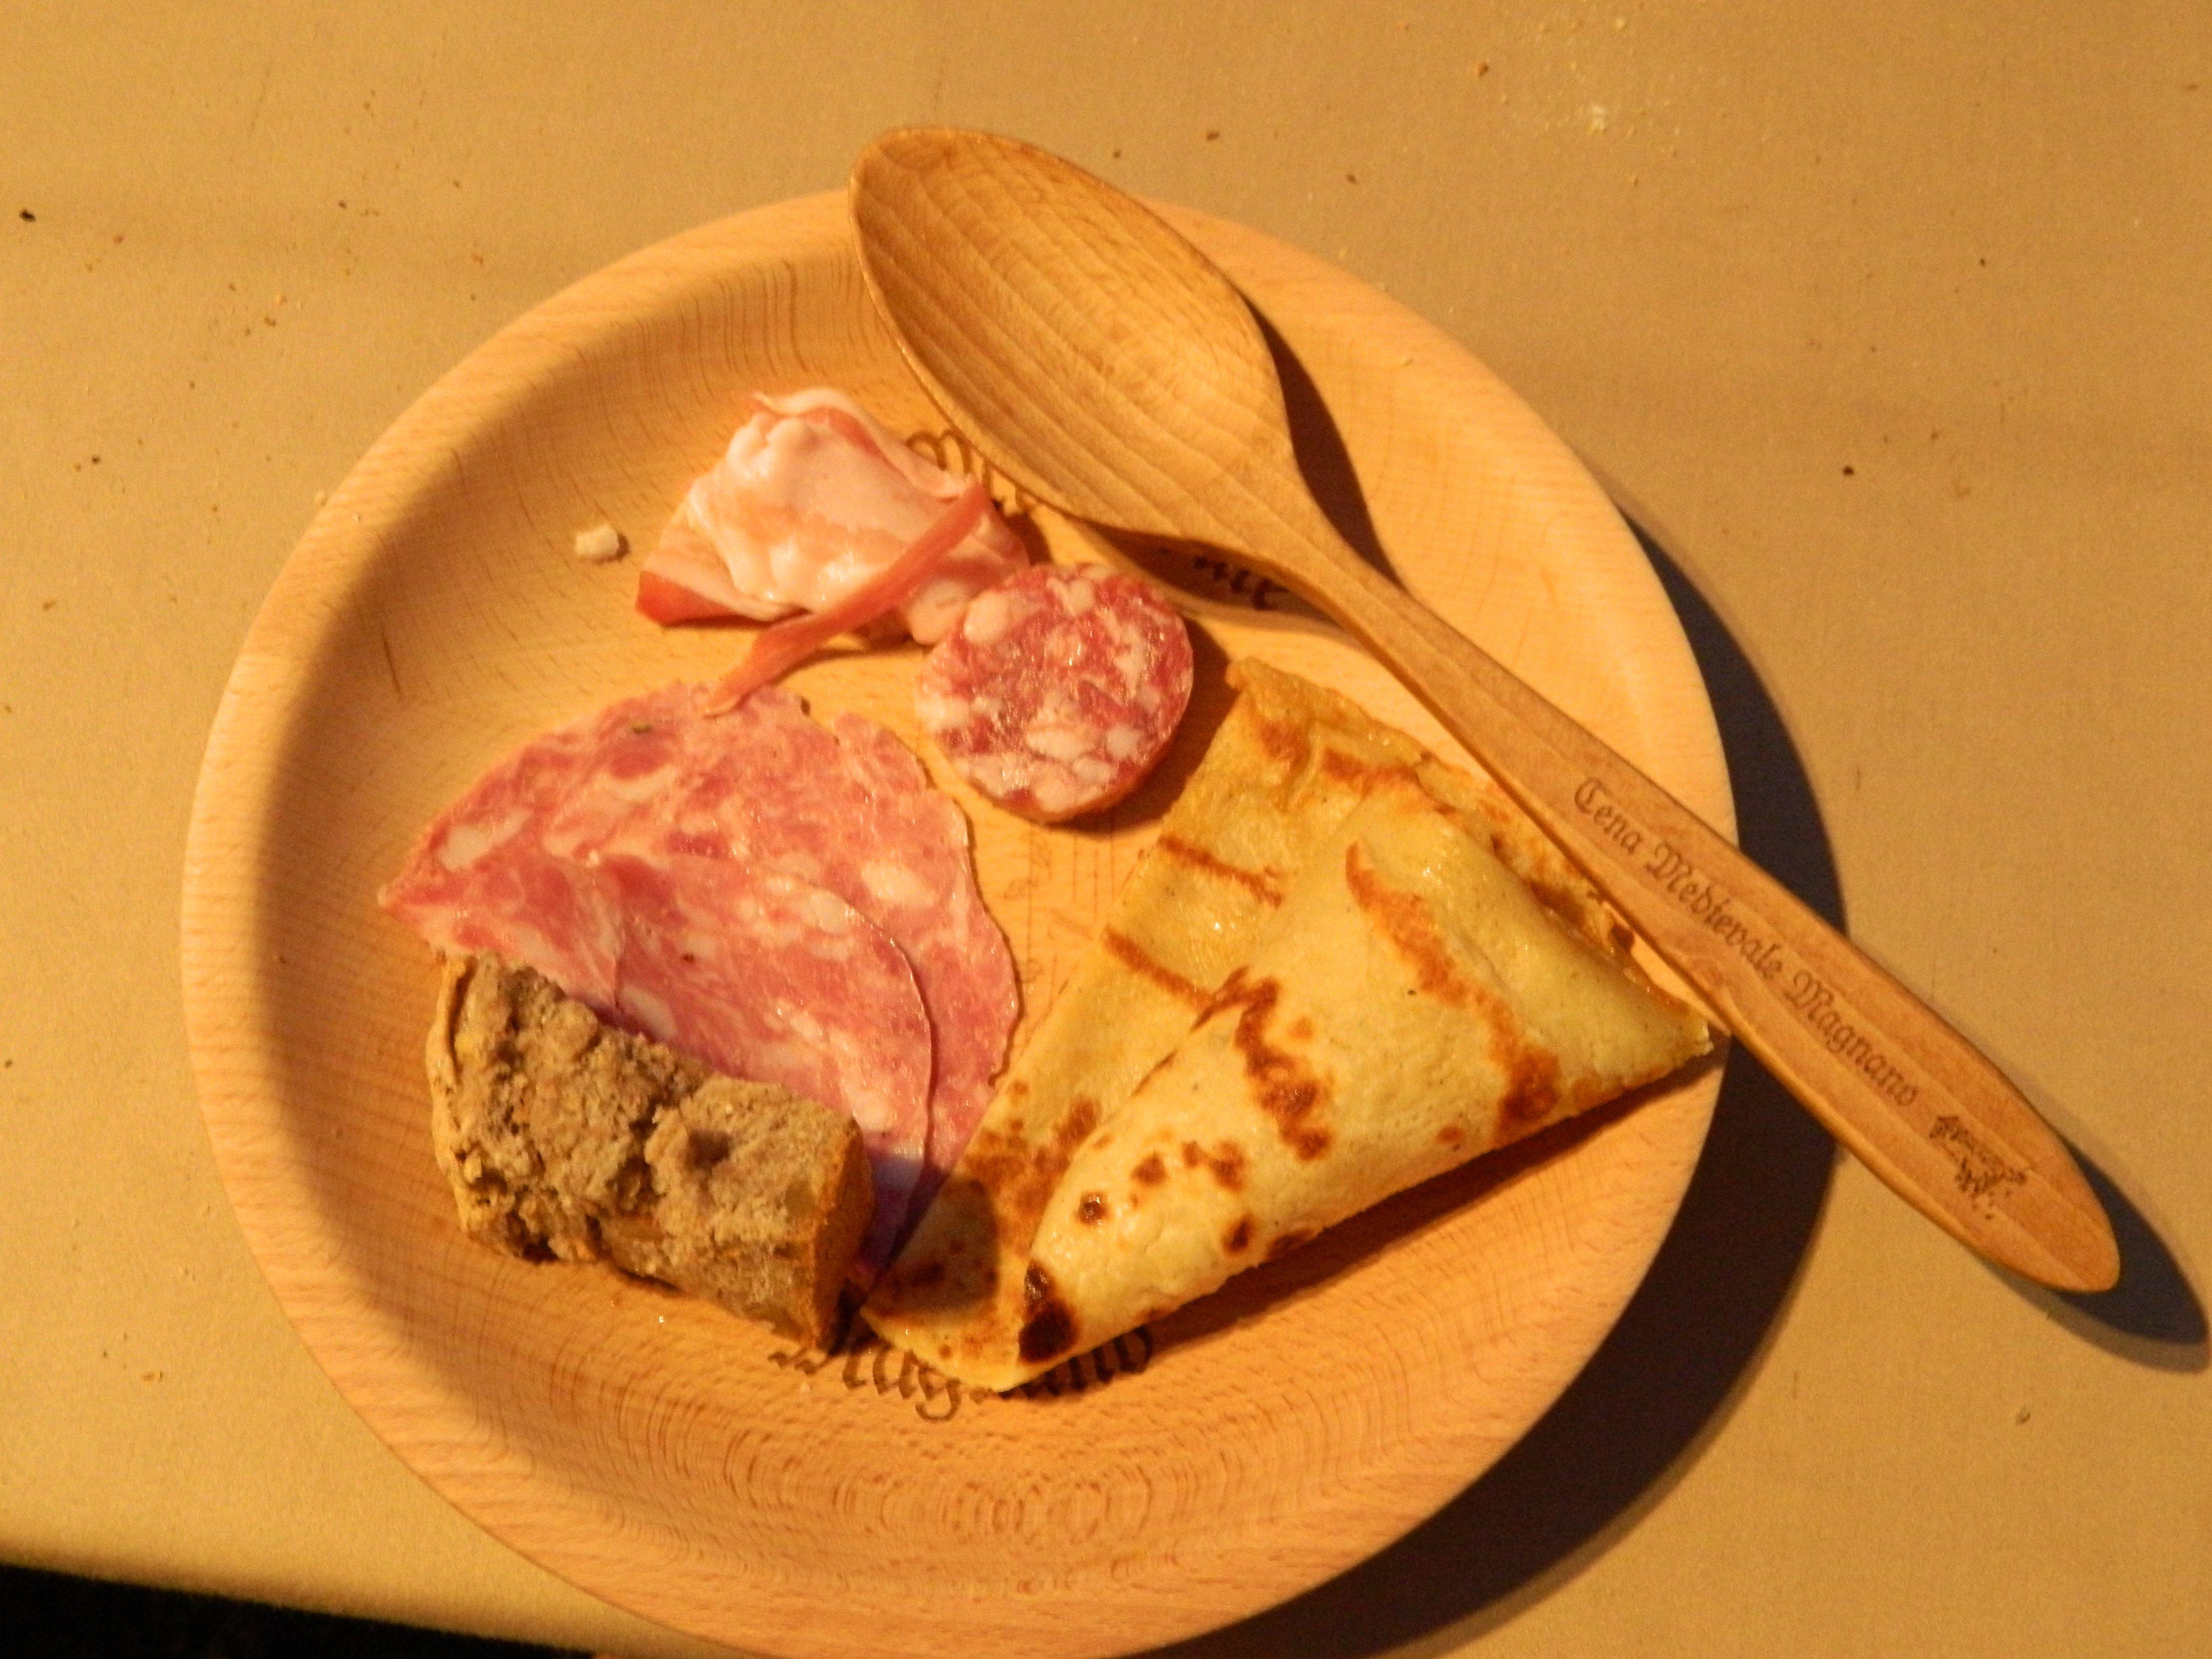 Medieval cuisine